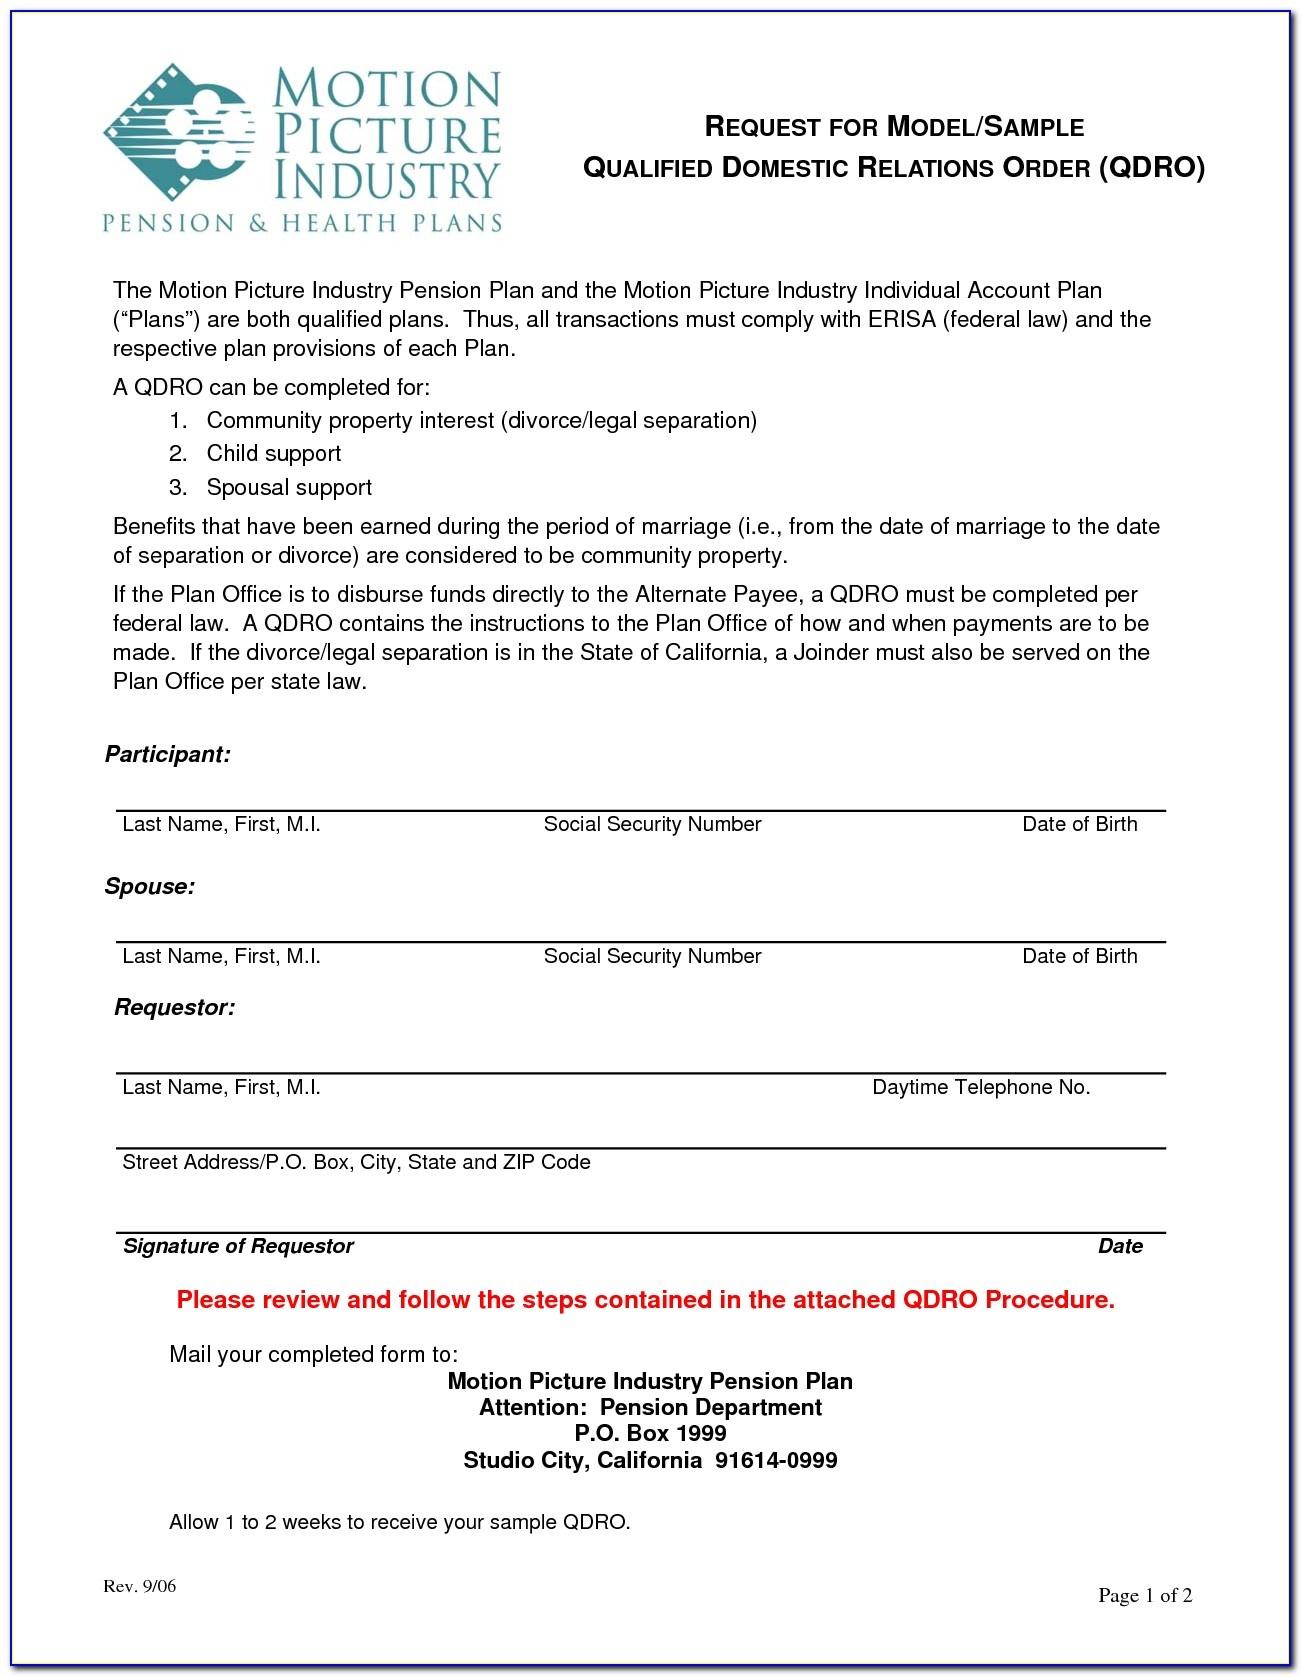 Free Qdro Forms California - Form : Resume Examples #8R2Nnxl2A7 - Free Printable Qdro Forms